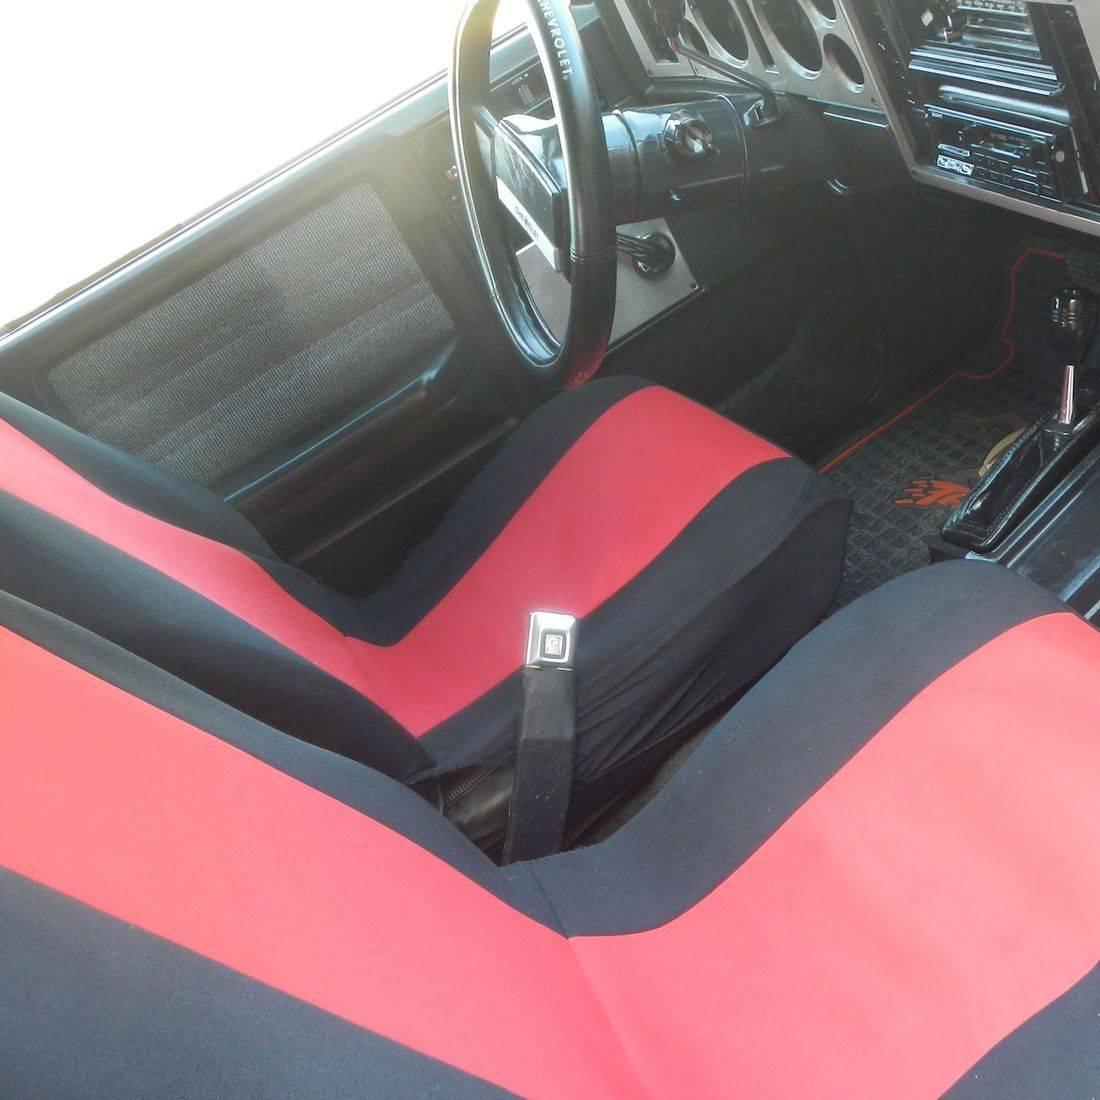 1985 Chevy Blazer 4x4